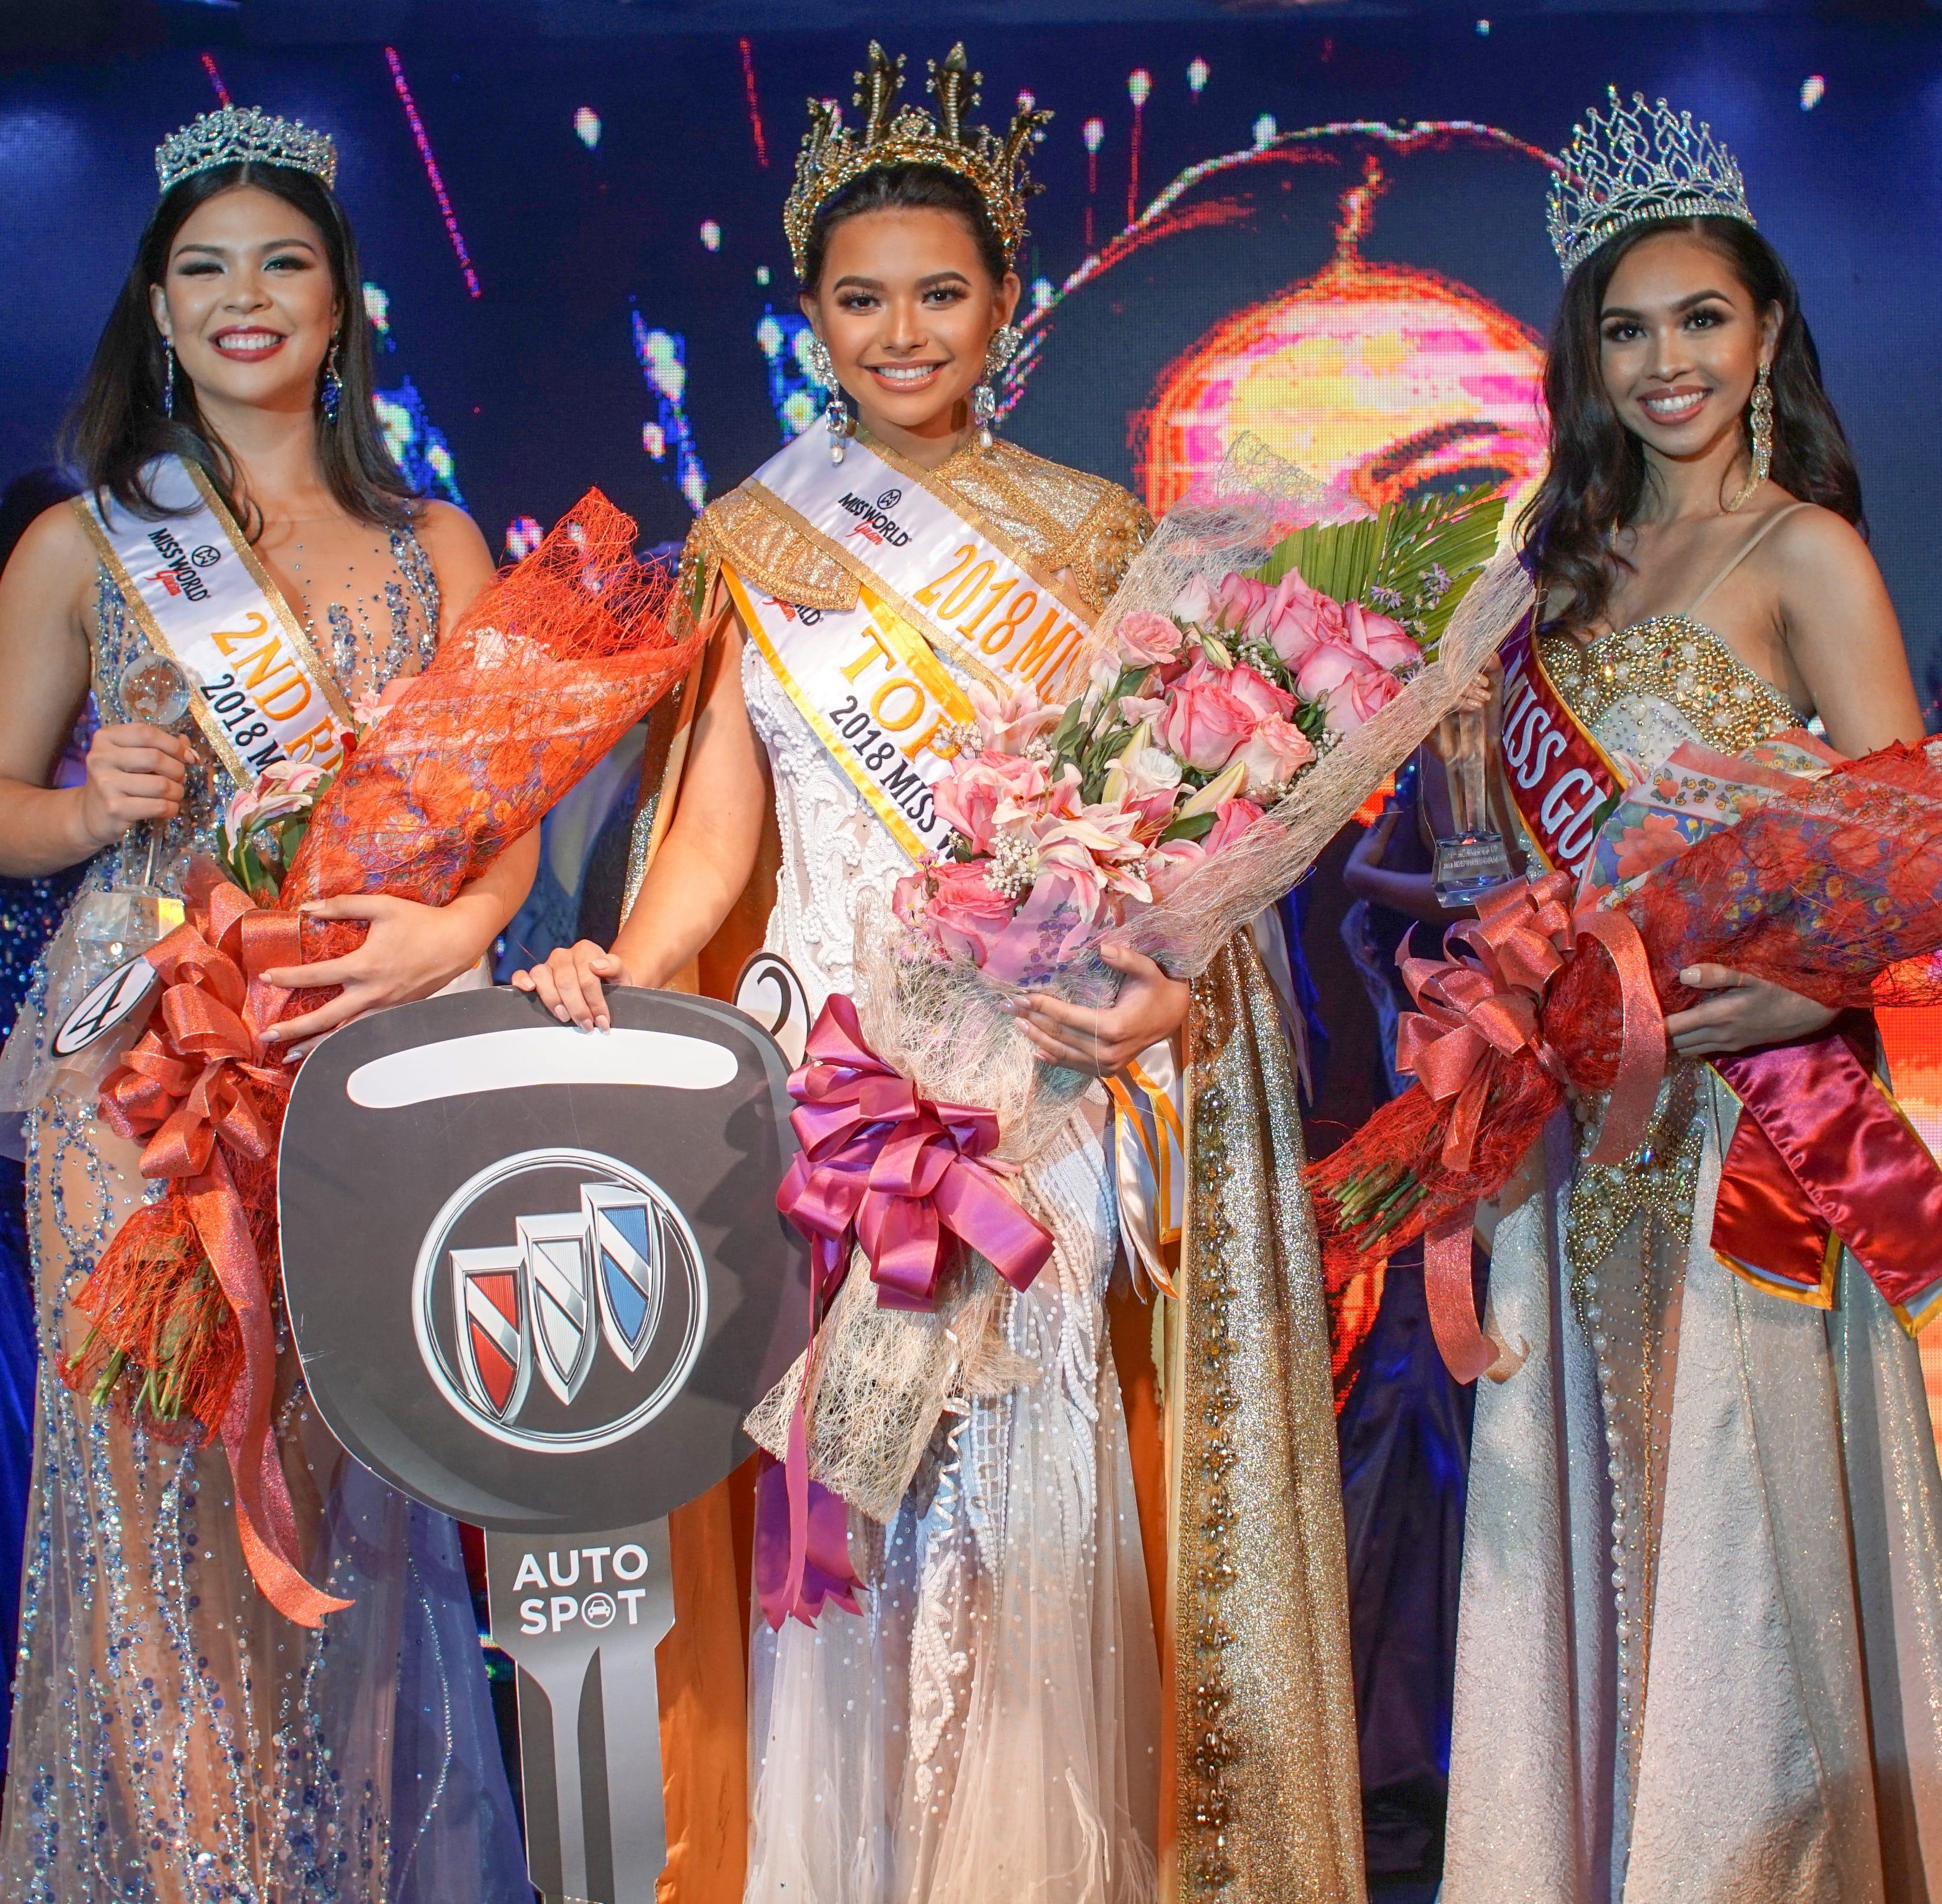 Gianna Sgambelluri crowned Miss Guam 2018